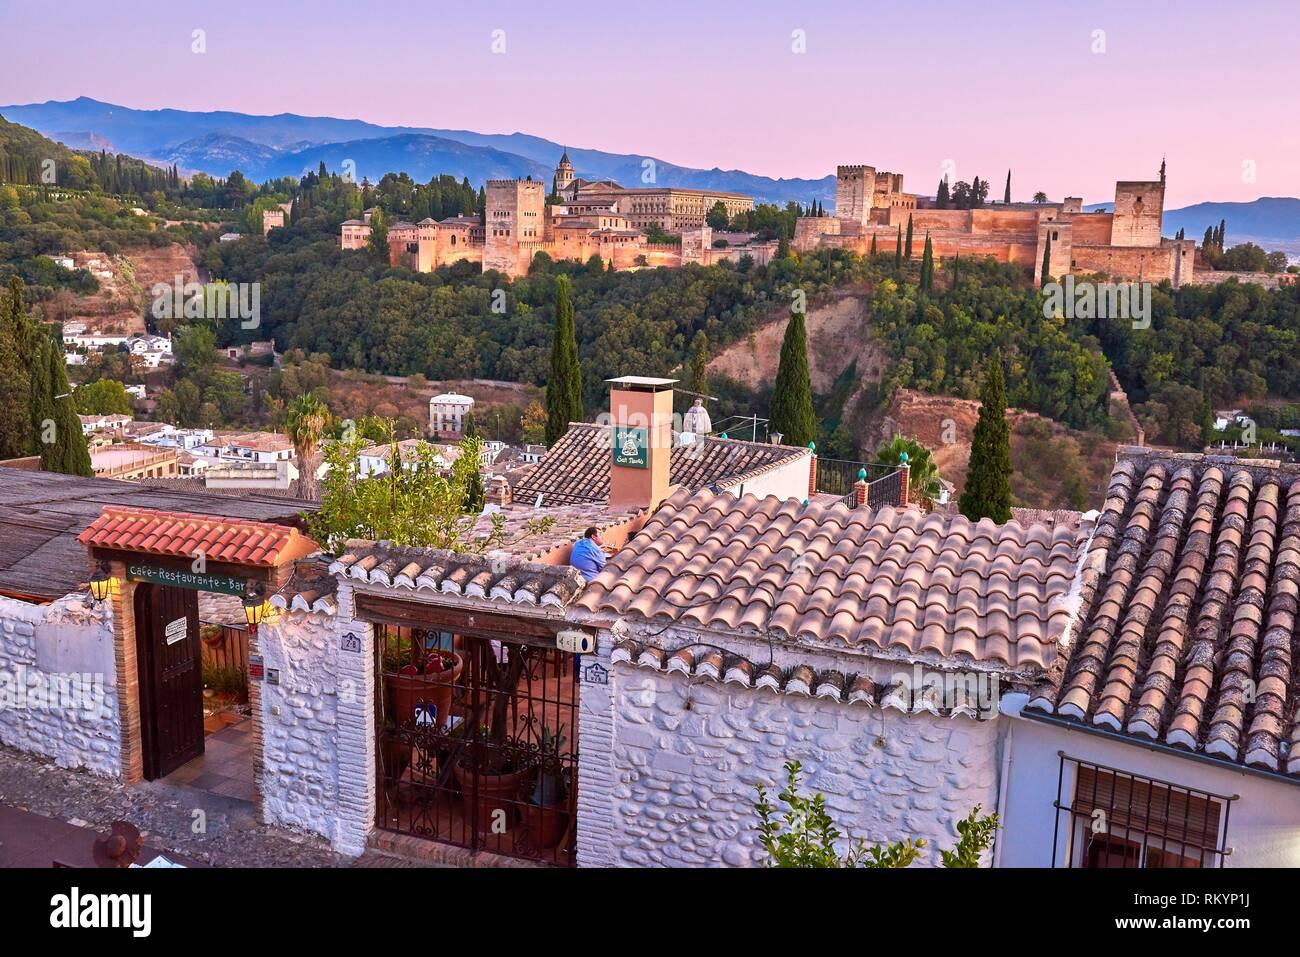 Alhambra, UNESCO World Heritage Site, Albaicin, Sierra Nevada and la Alhambra at Sunset, Granada, Andalusia, Spain. - Stock Image